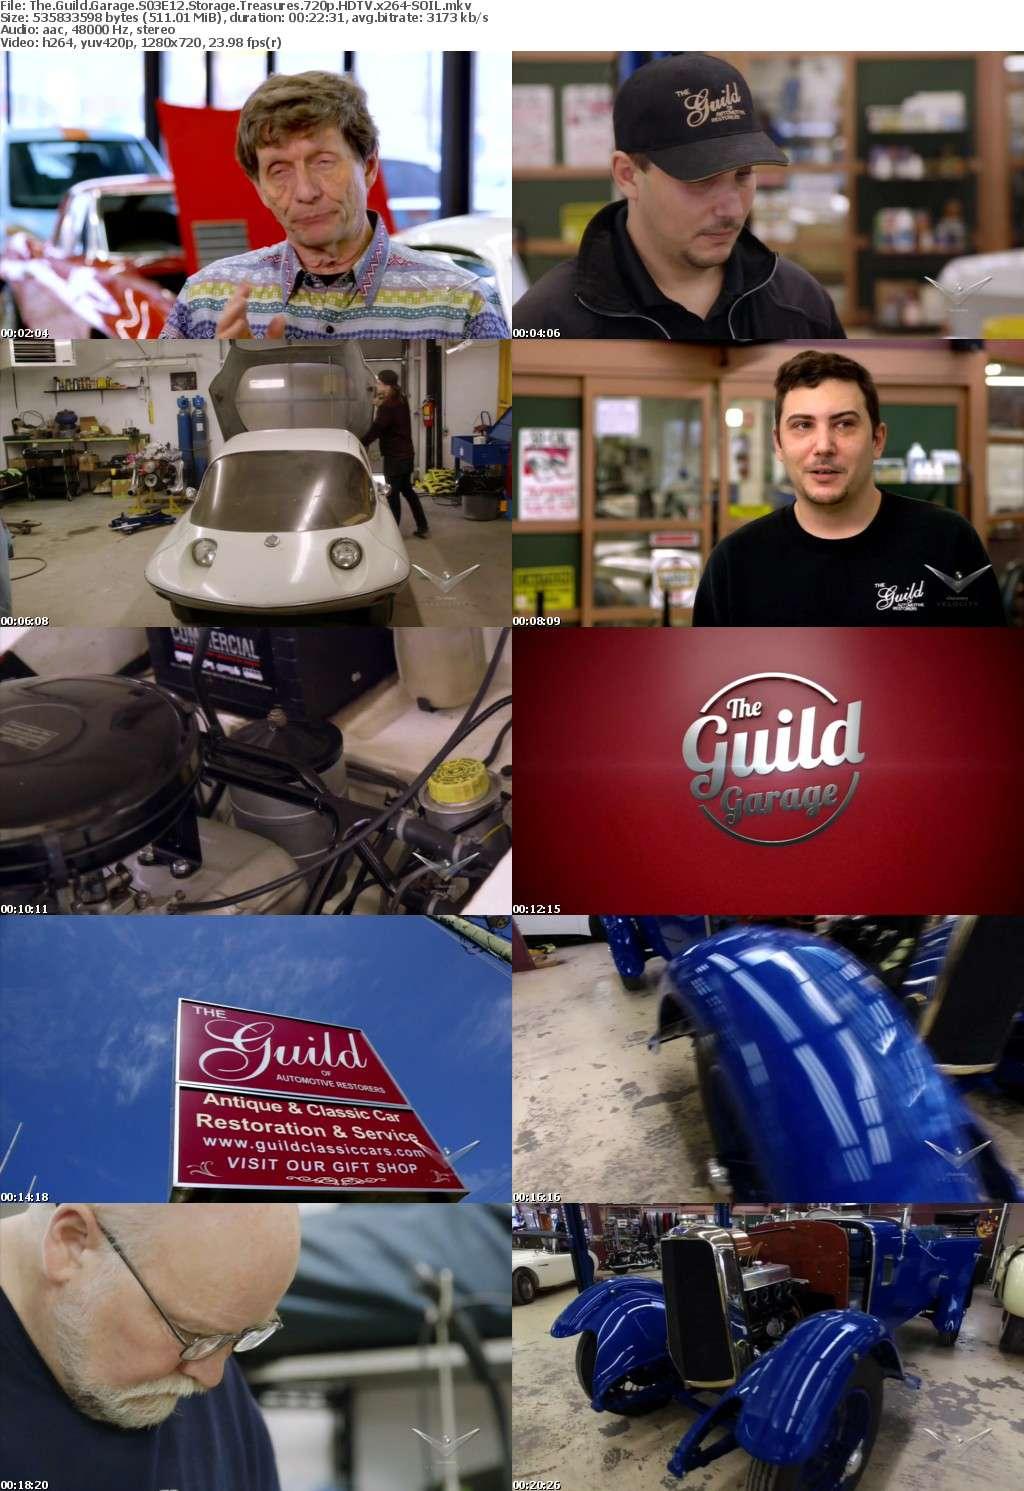 The Guild Garage S03E12 Storage Treasures 720p HDTV x264-SOIL